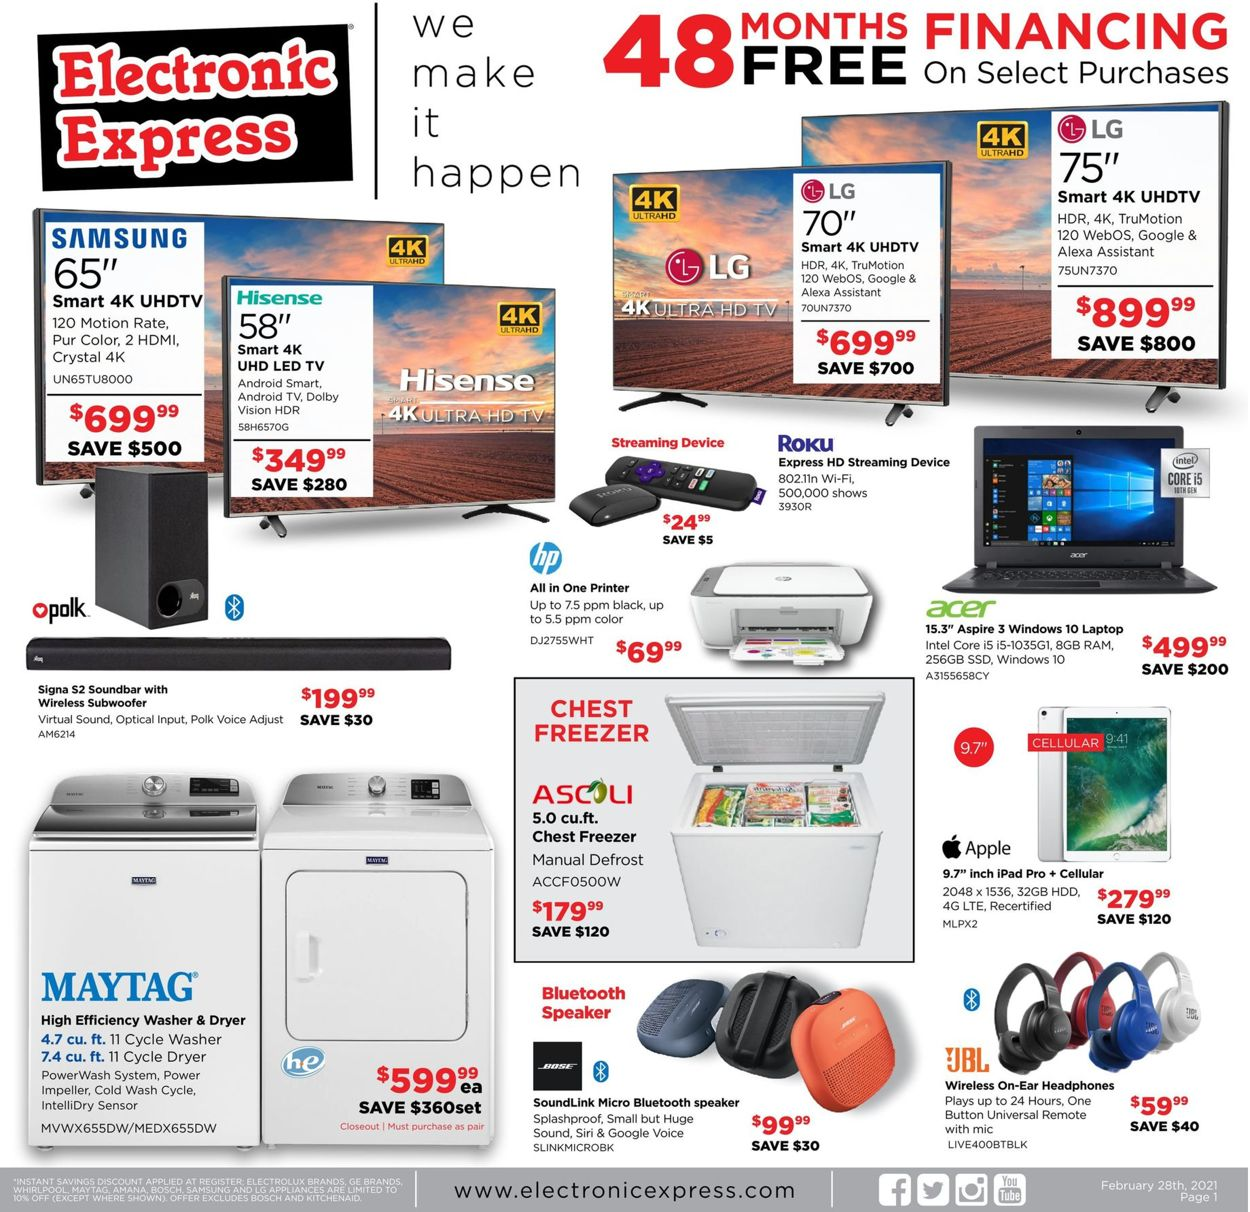 Electronic Express Weekly Ad Circular - valid 02/28-03/06/2021